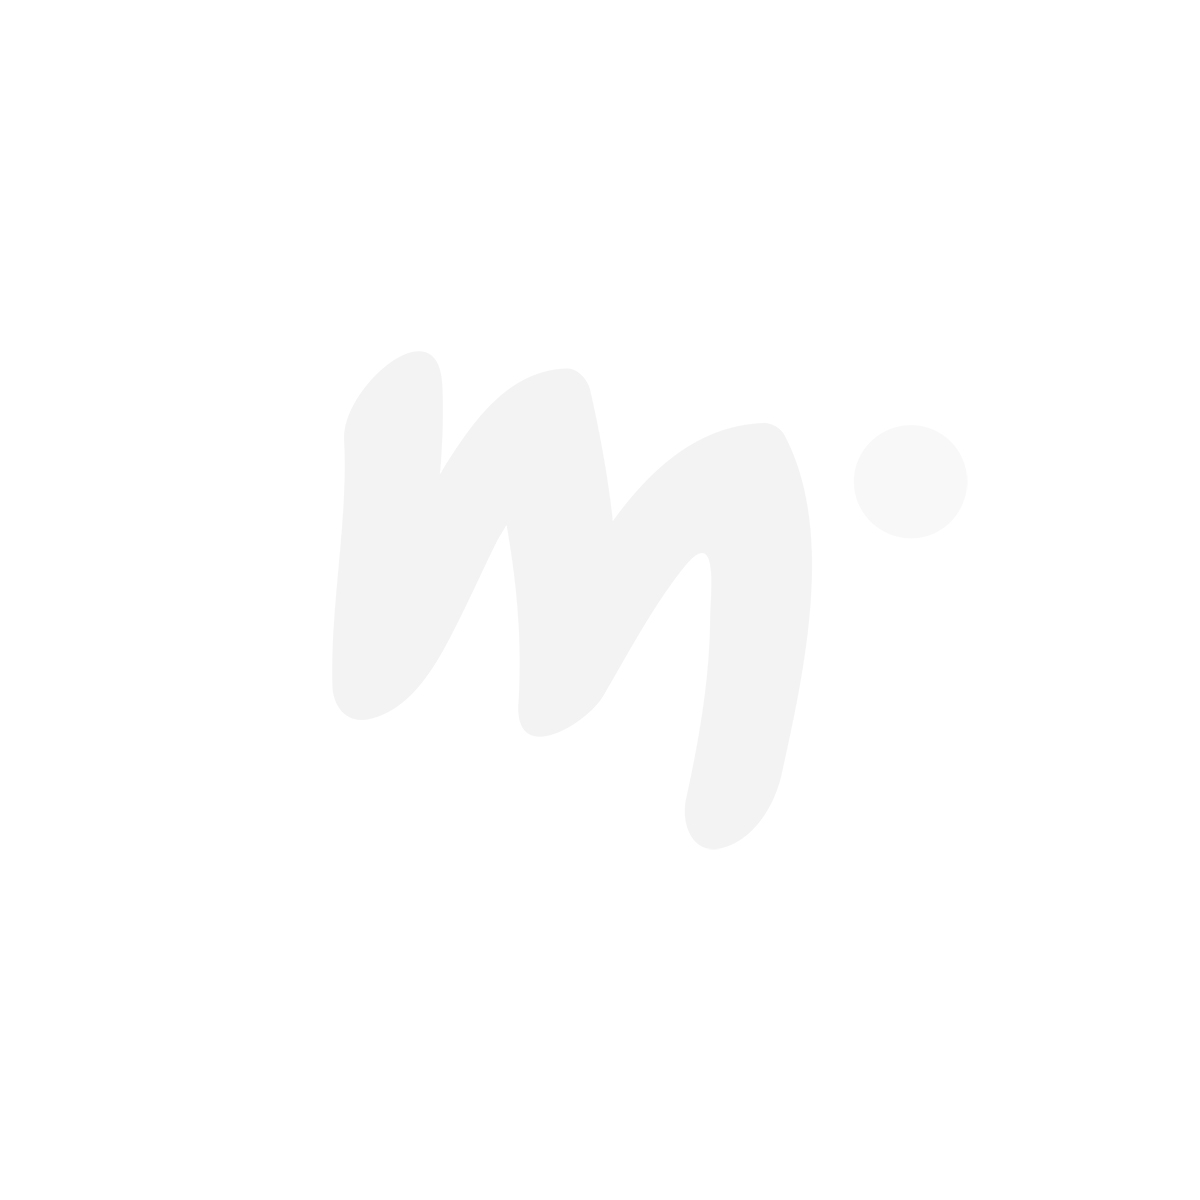 Moomin Sweetheart Tin Sign Chalkboard